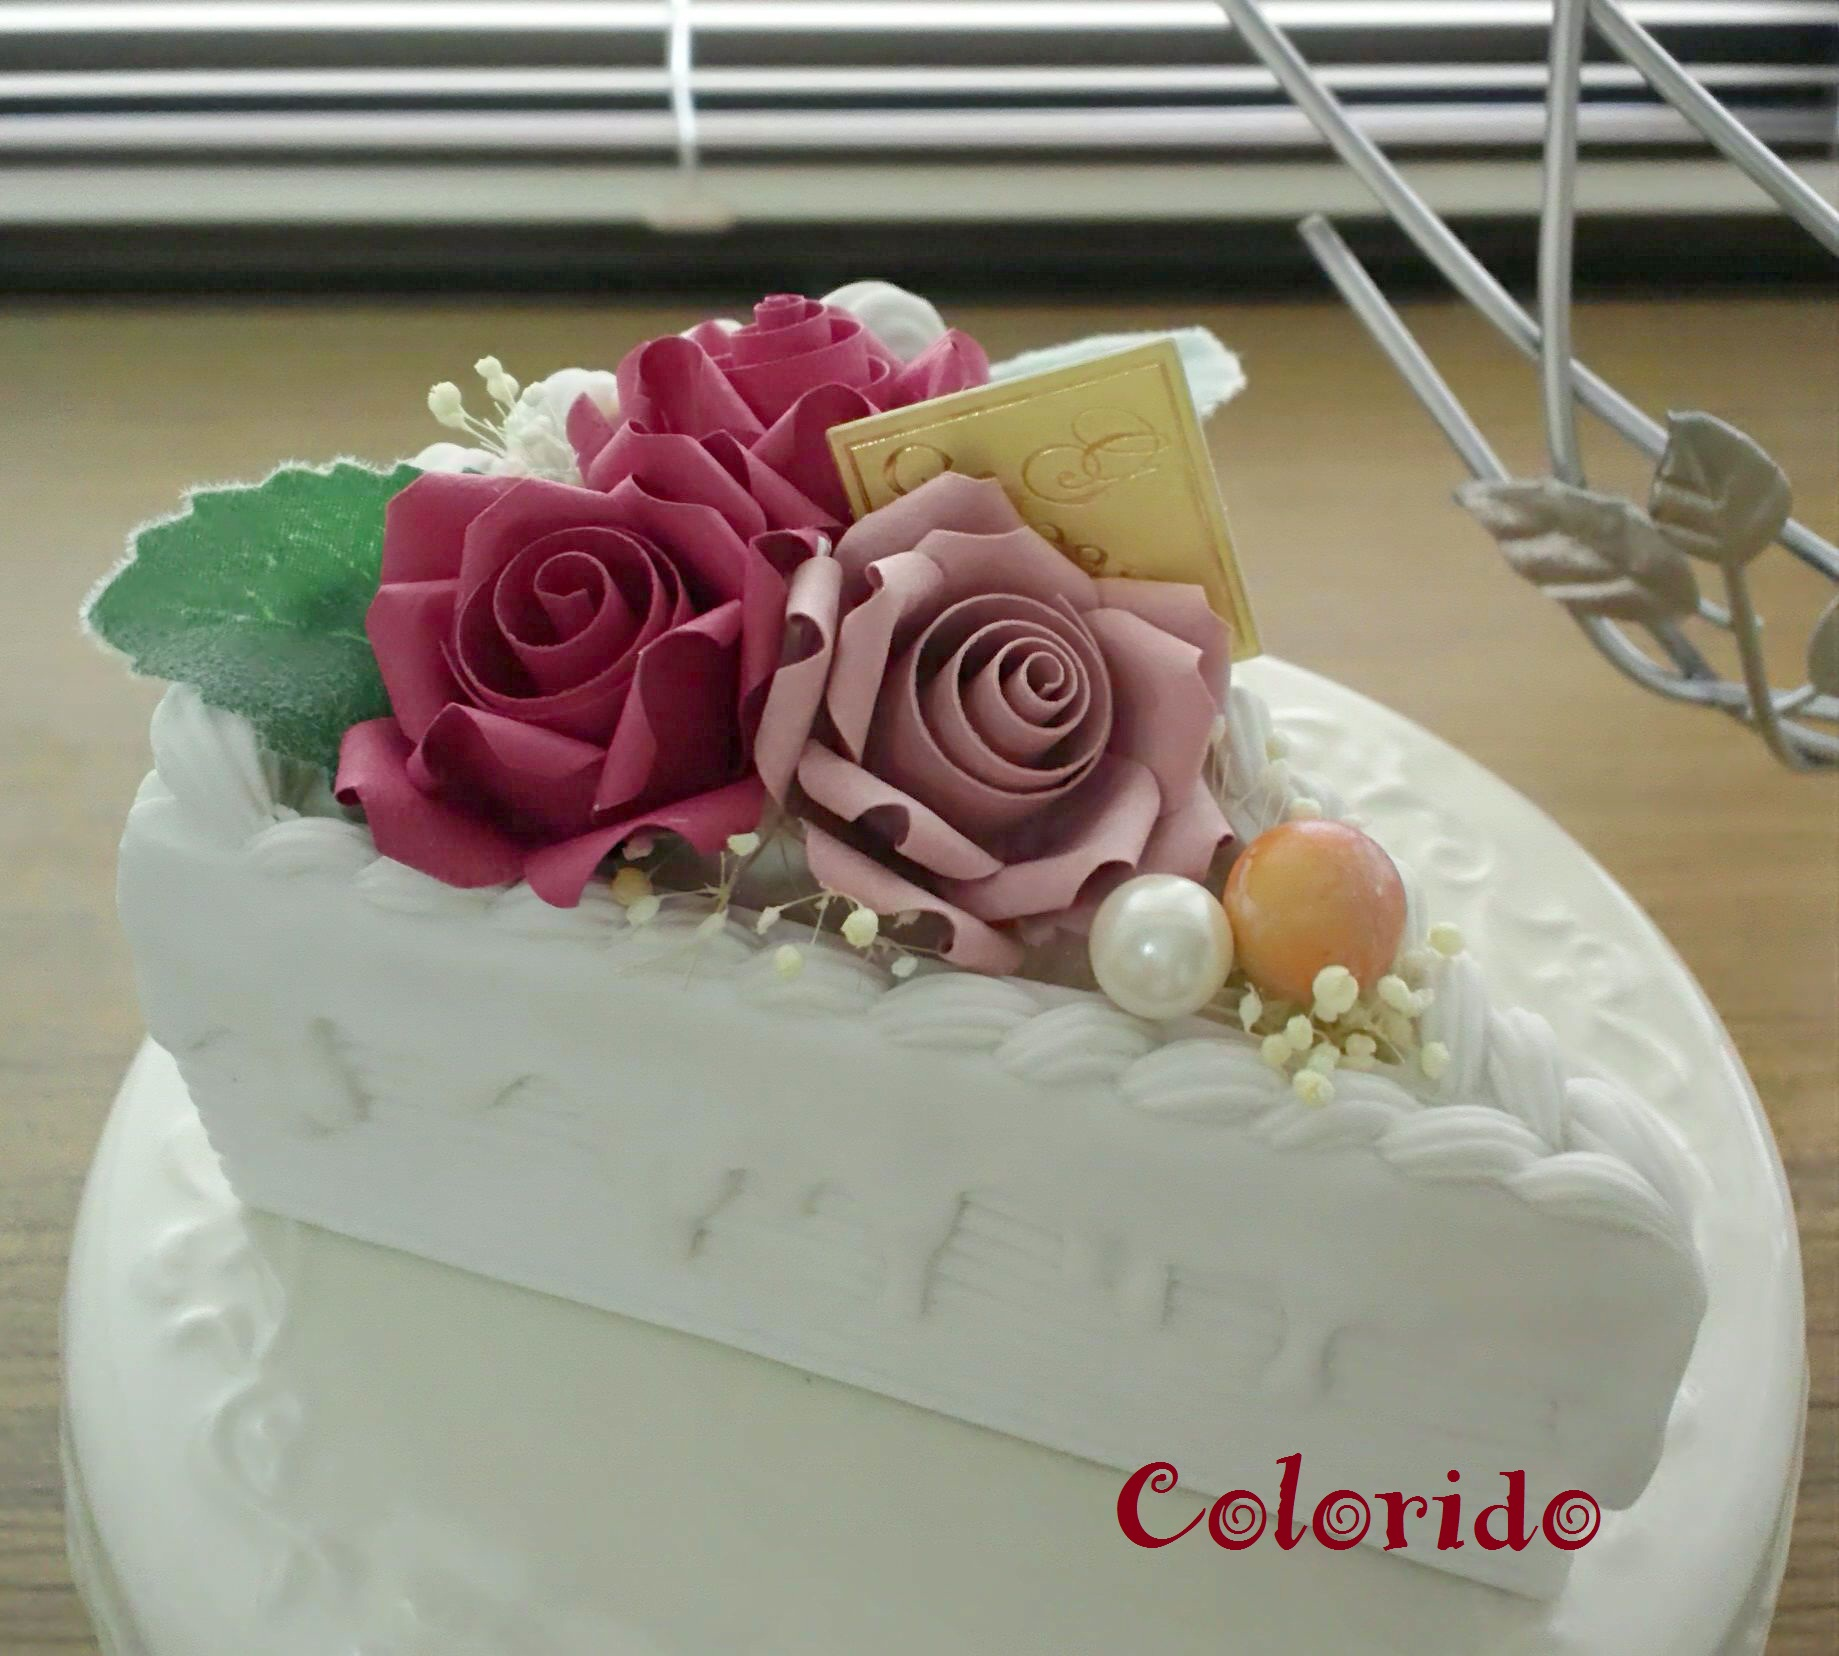 ケーキ薔薇